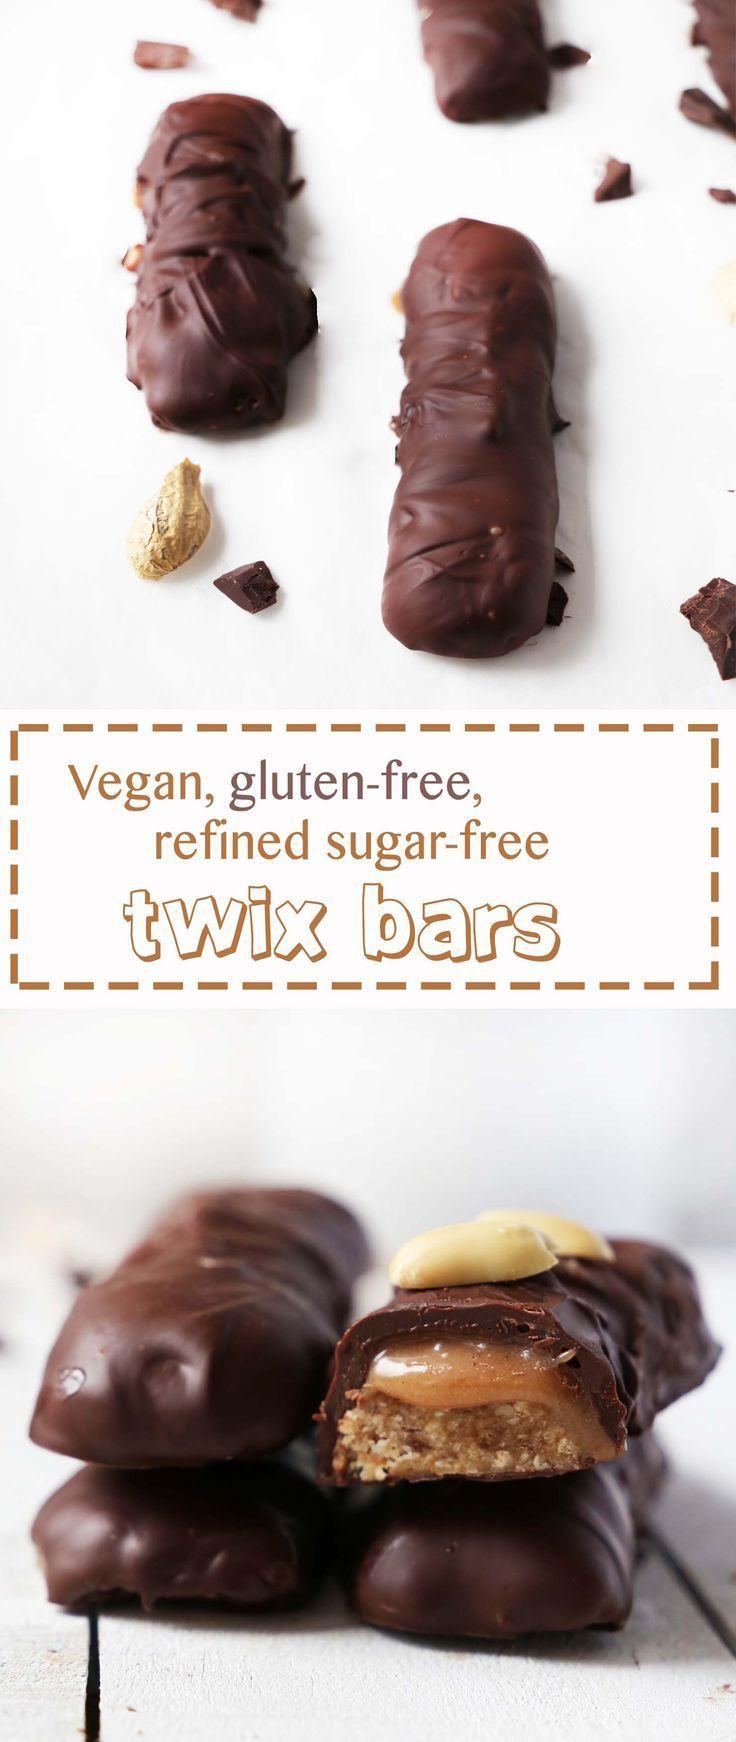 Vegan gluten-free, refined sugar-free TWIX BARS More